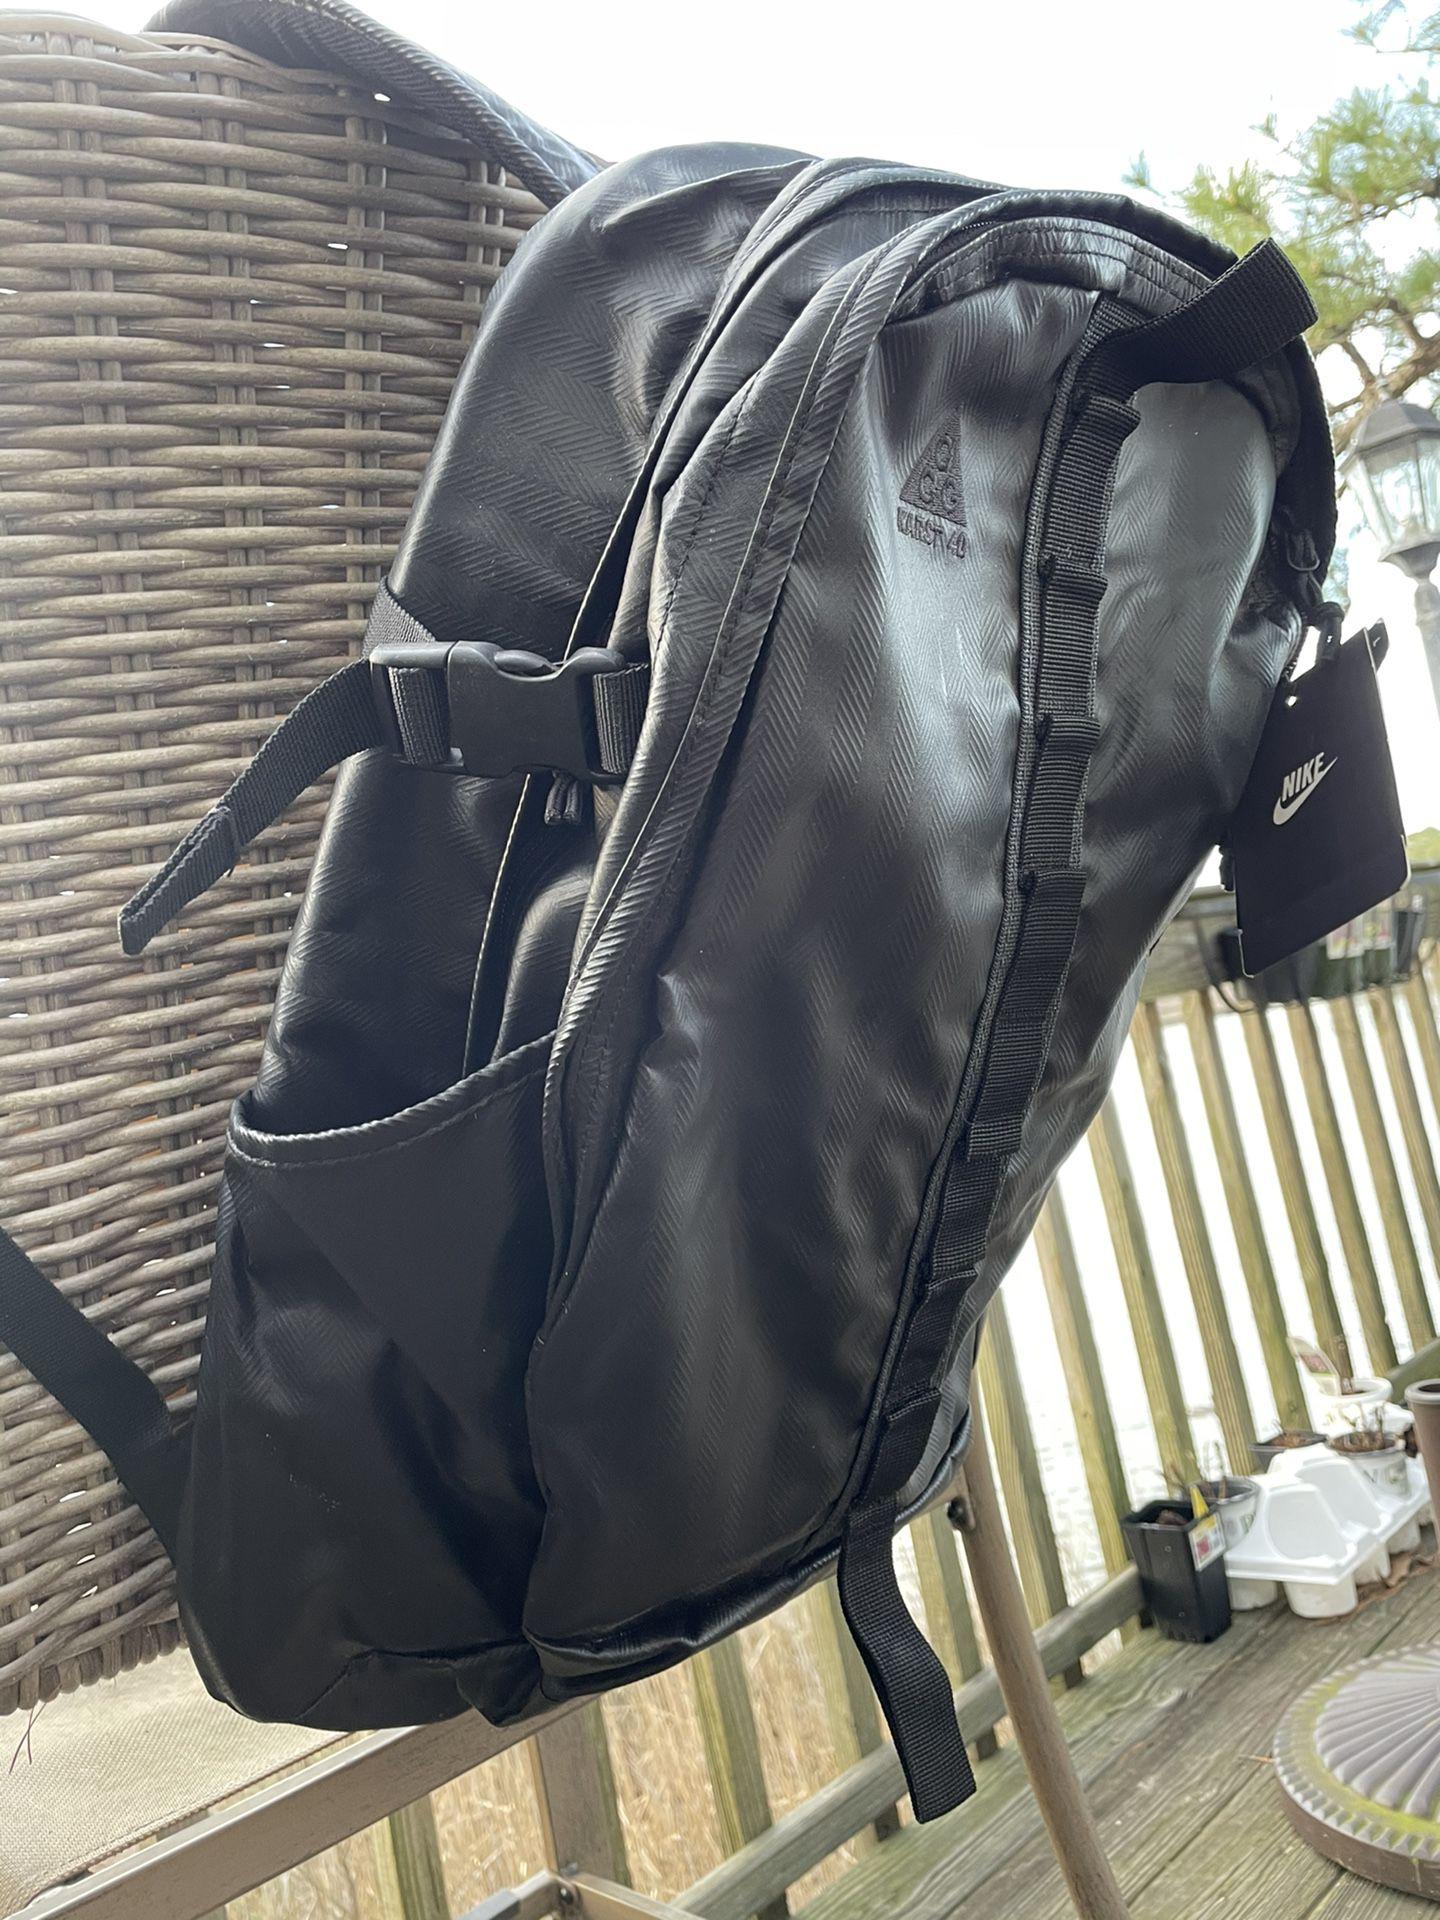 New/never Used - Black Nike Backpack